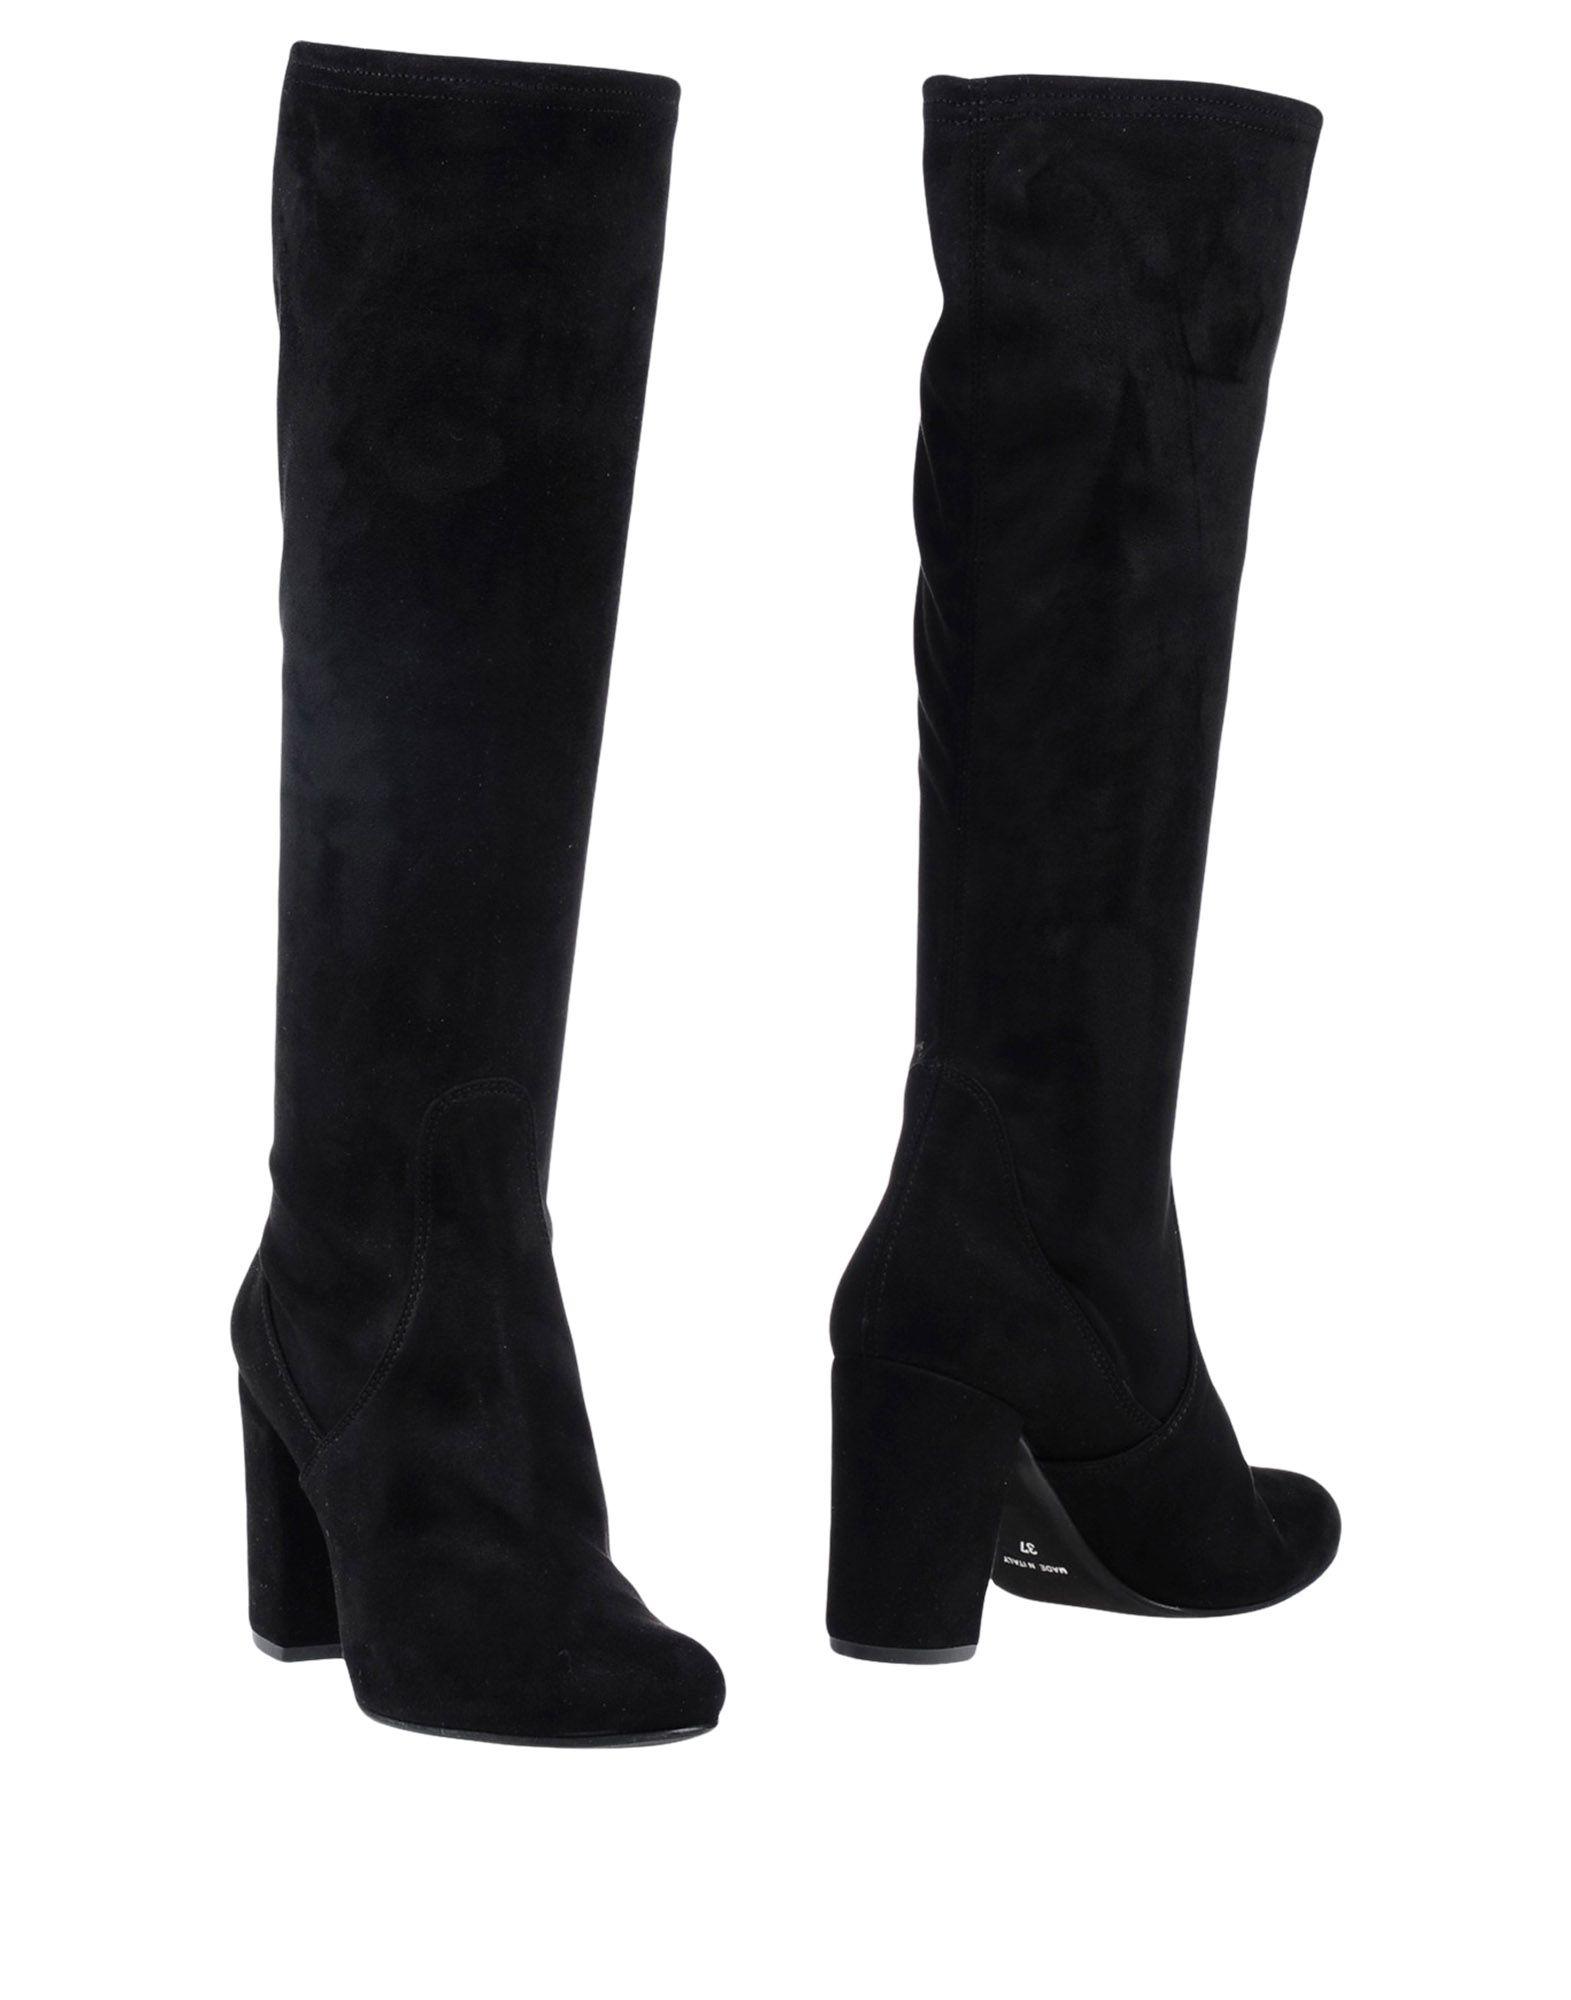 Stele Boots Boots - Women Stele Boots Stele online on  Australia - 11454425BL e6f972